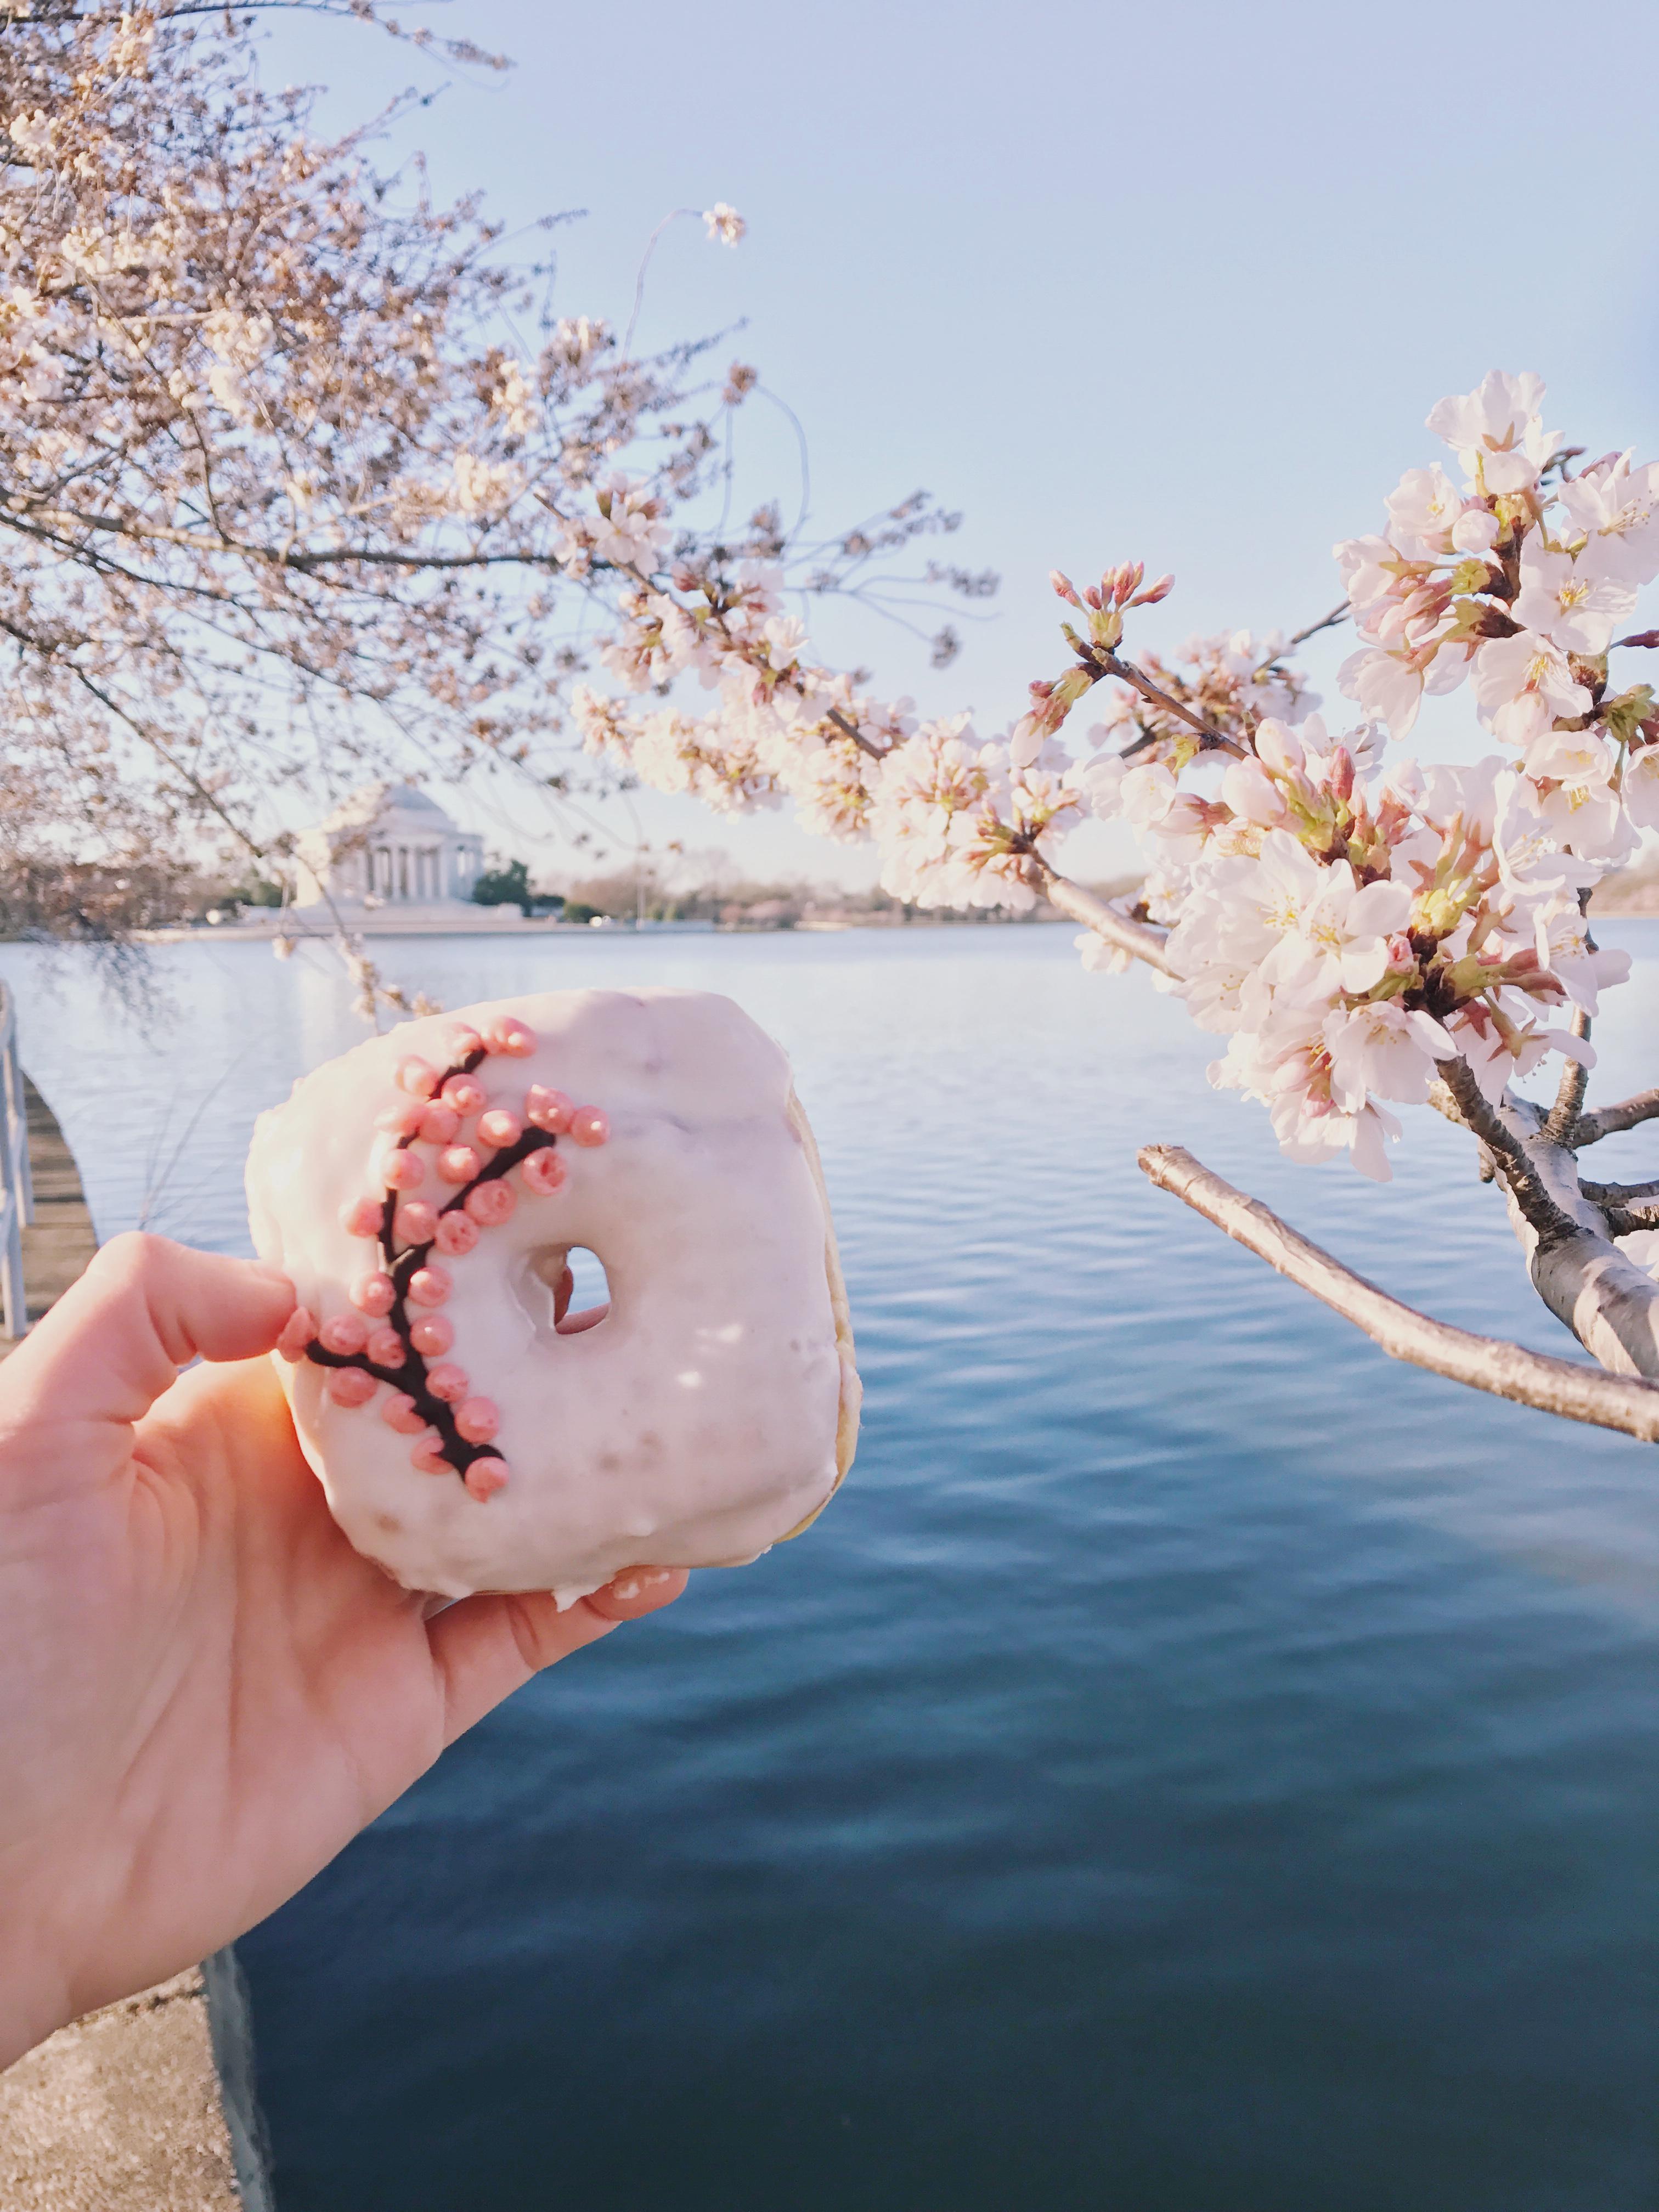 5 Instagram Worthy Locations in Washington D.C. - The Tidal Basin during Peak Cherry Blossom Season